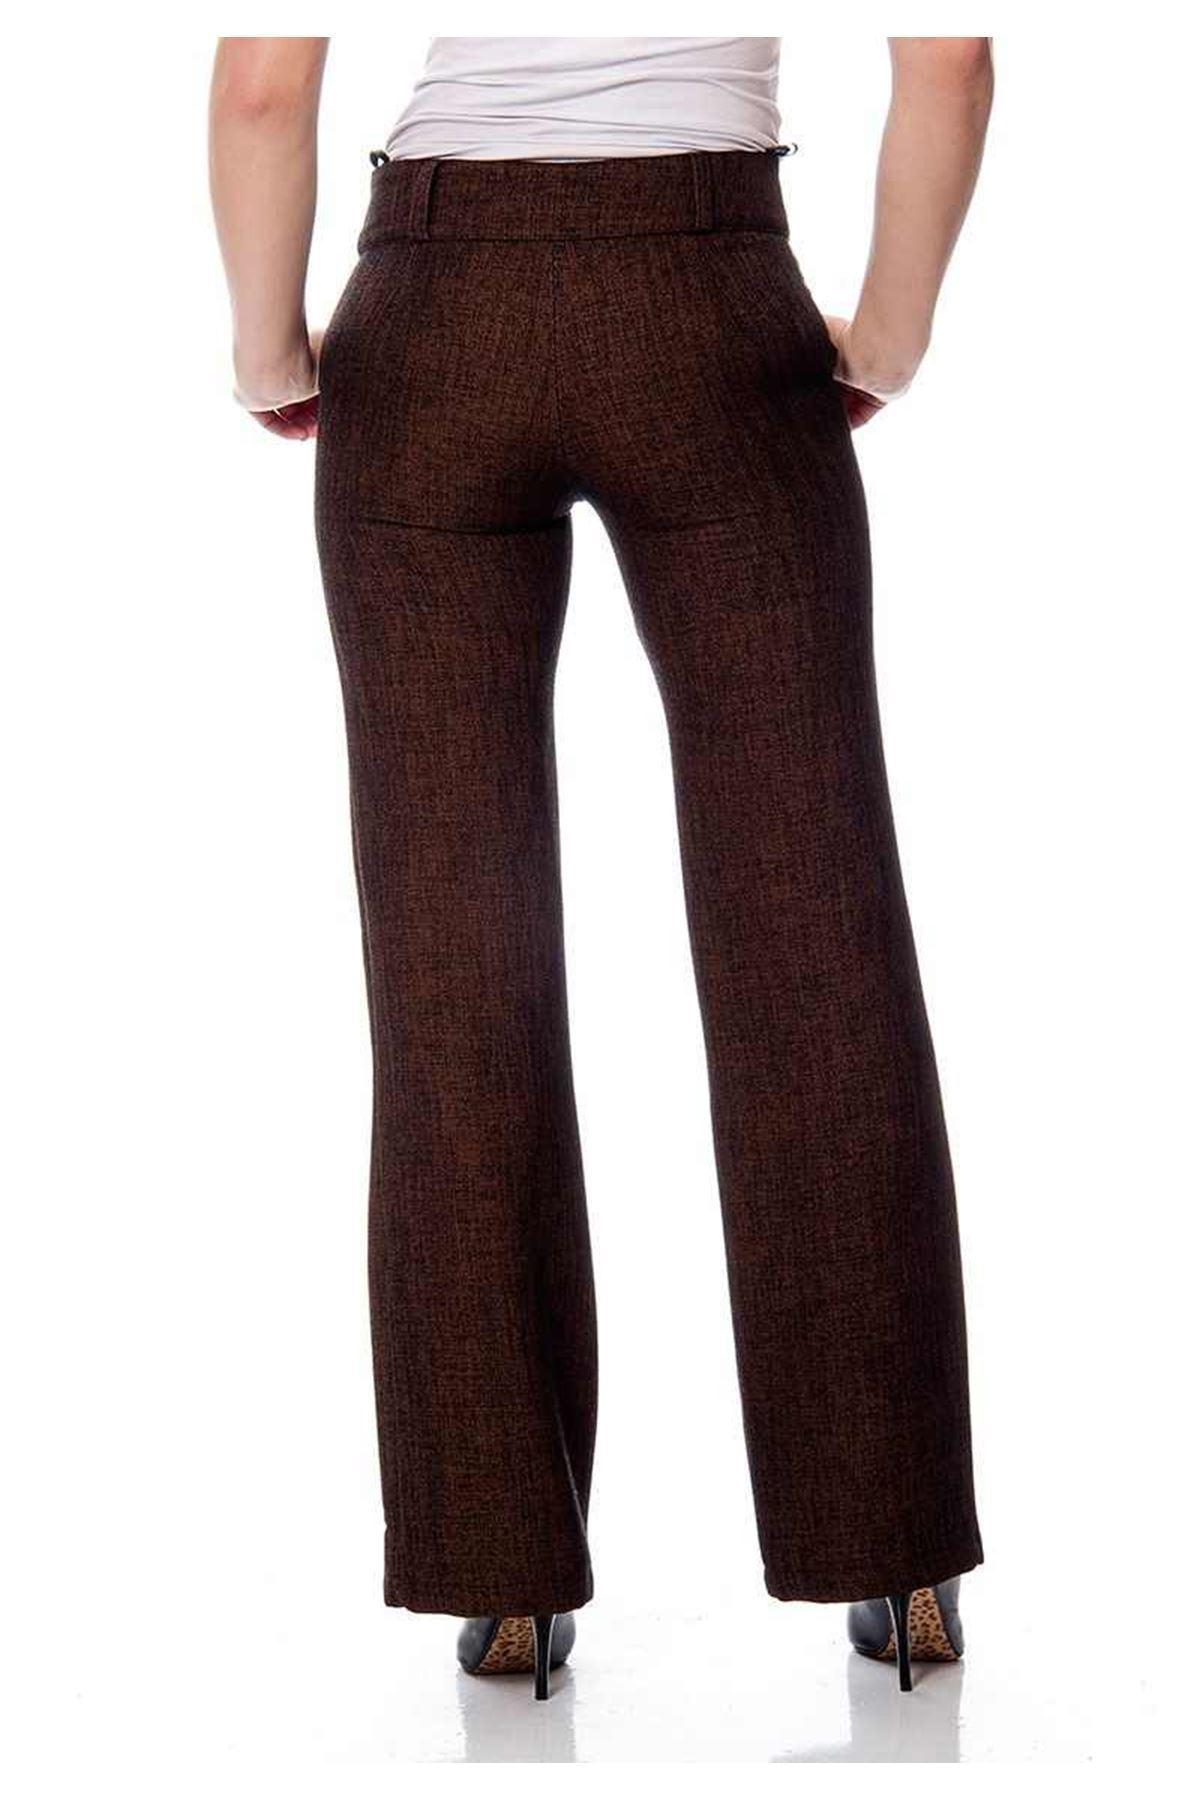 Kahverengi Kırçıllı Kumaş Pantolon I7-111410